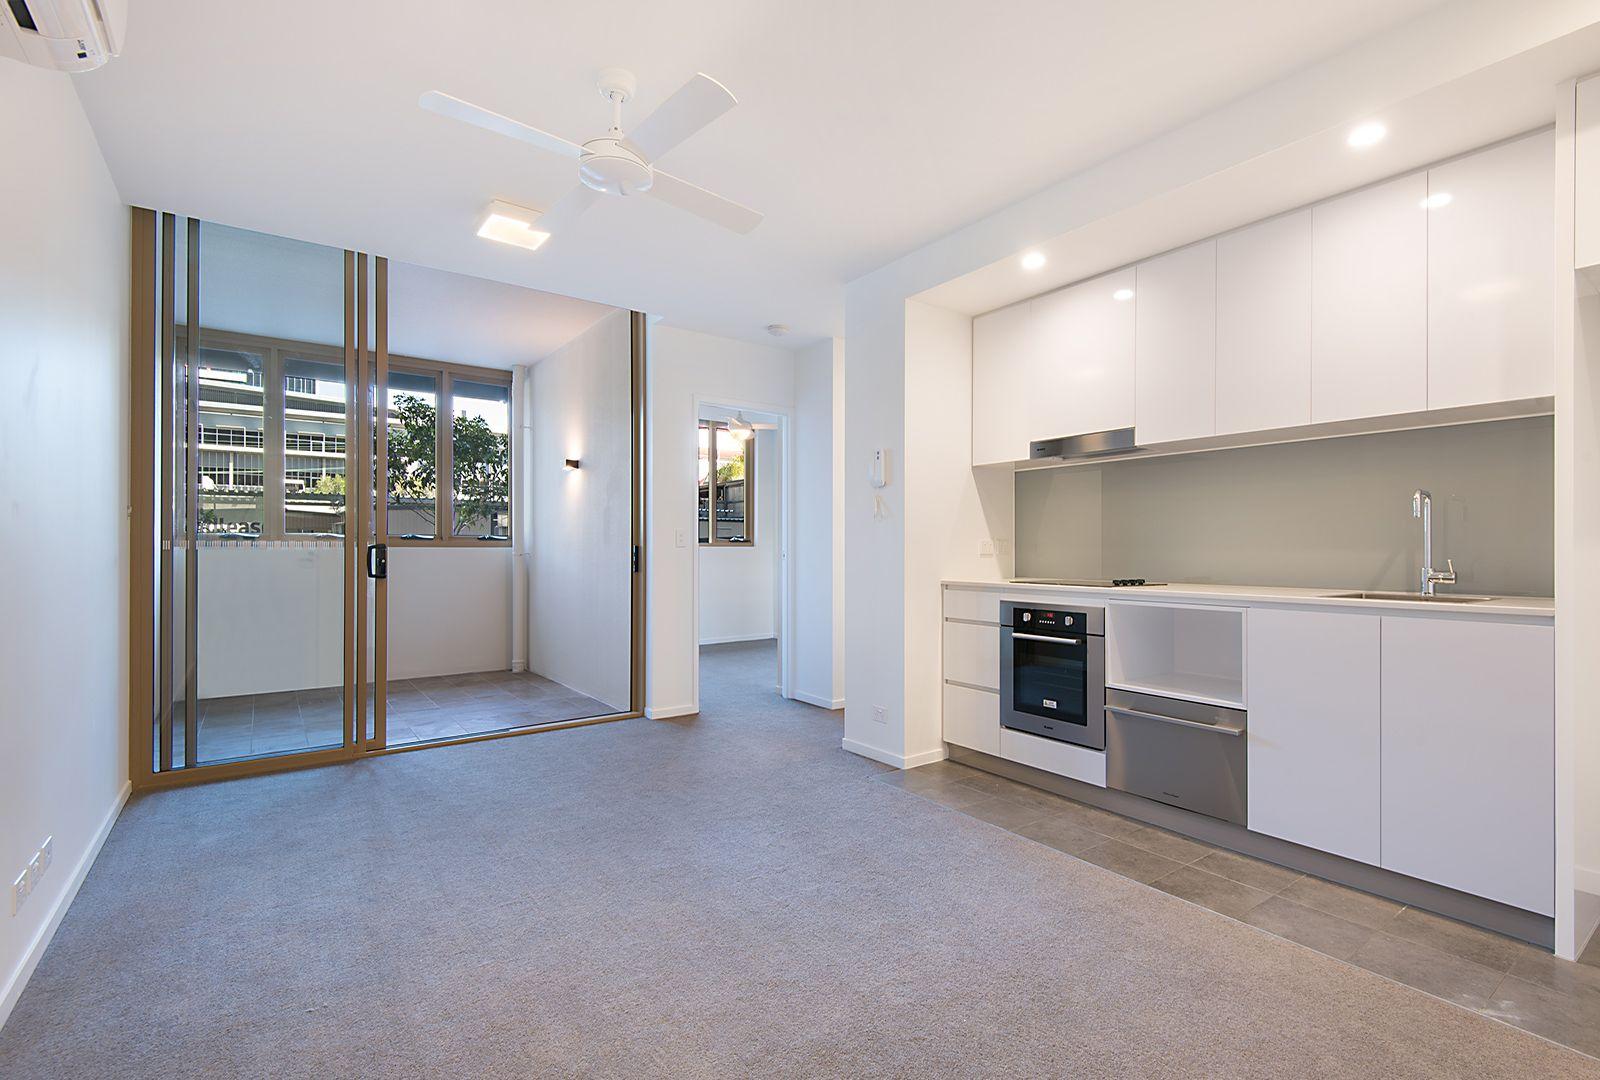 M02/191 Constance Street, Bowen Hills QLD 4006, Image 1